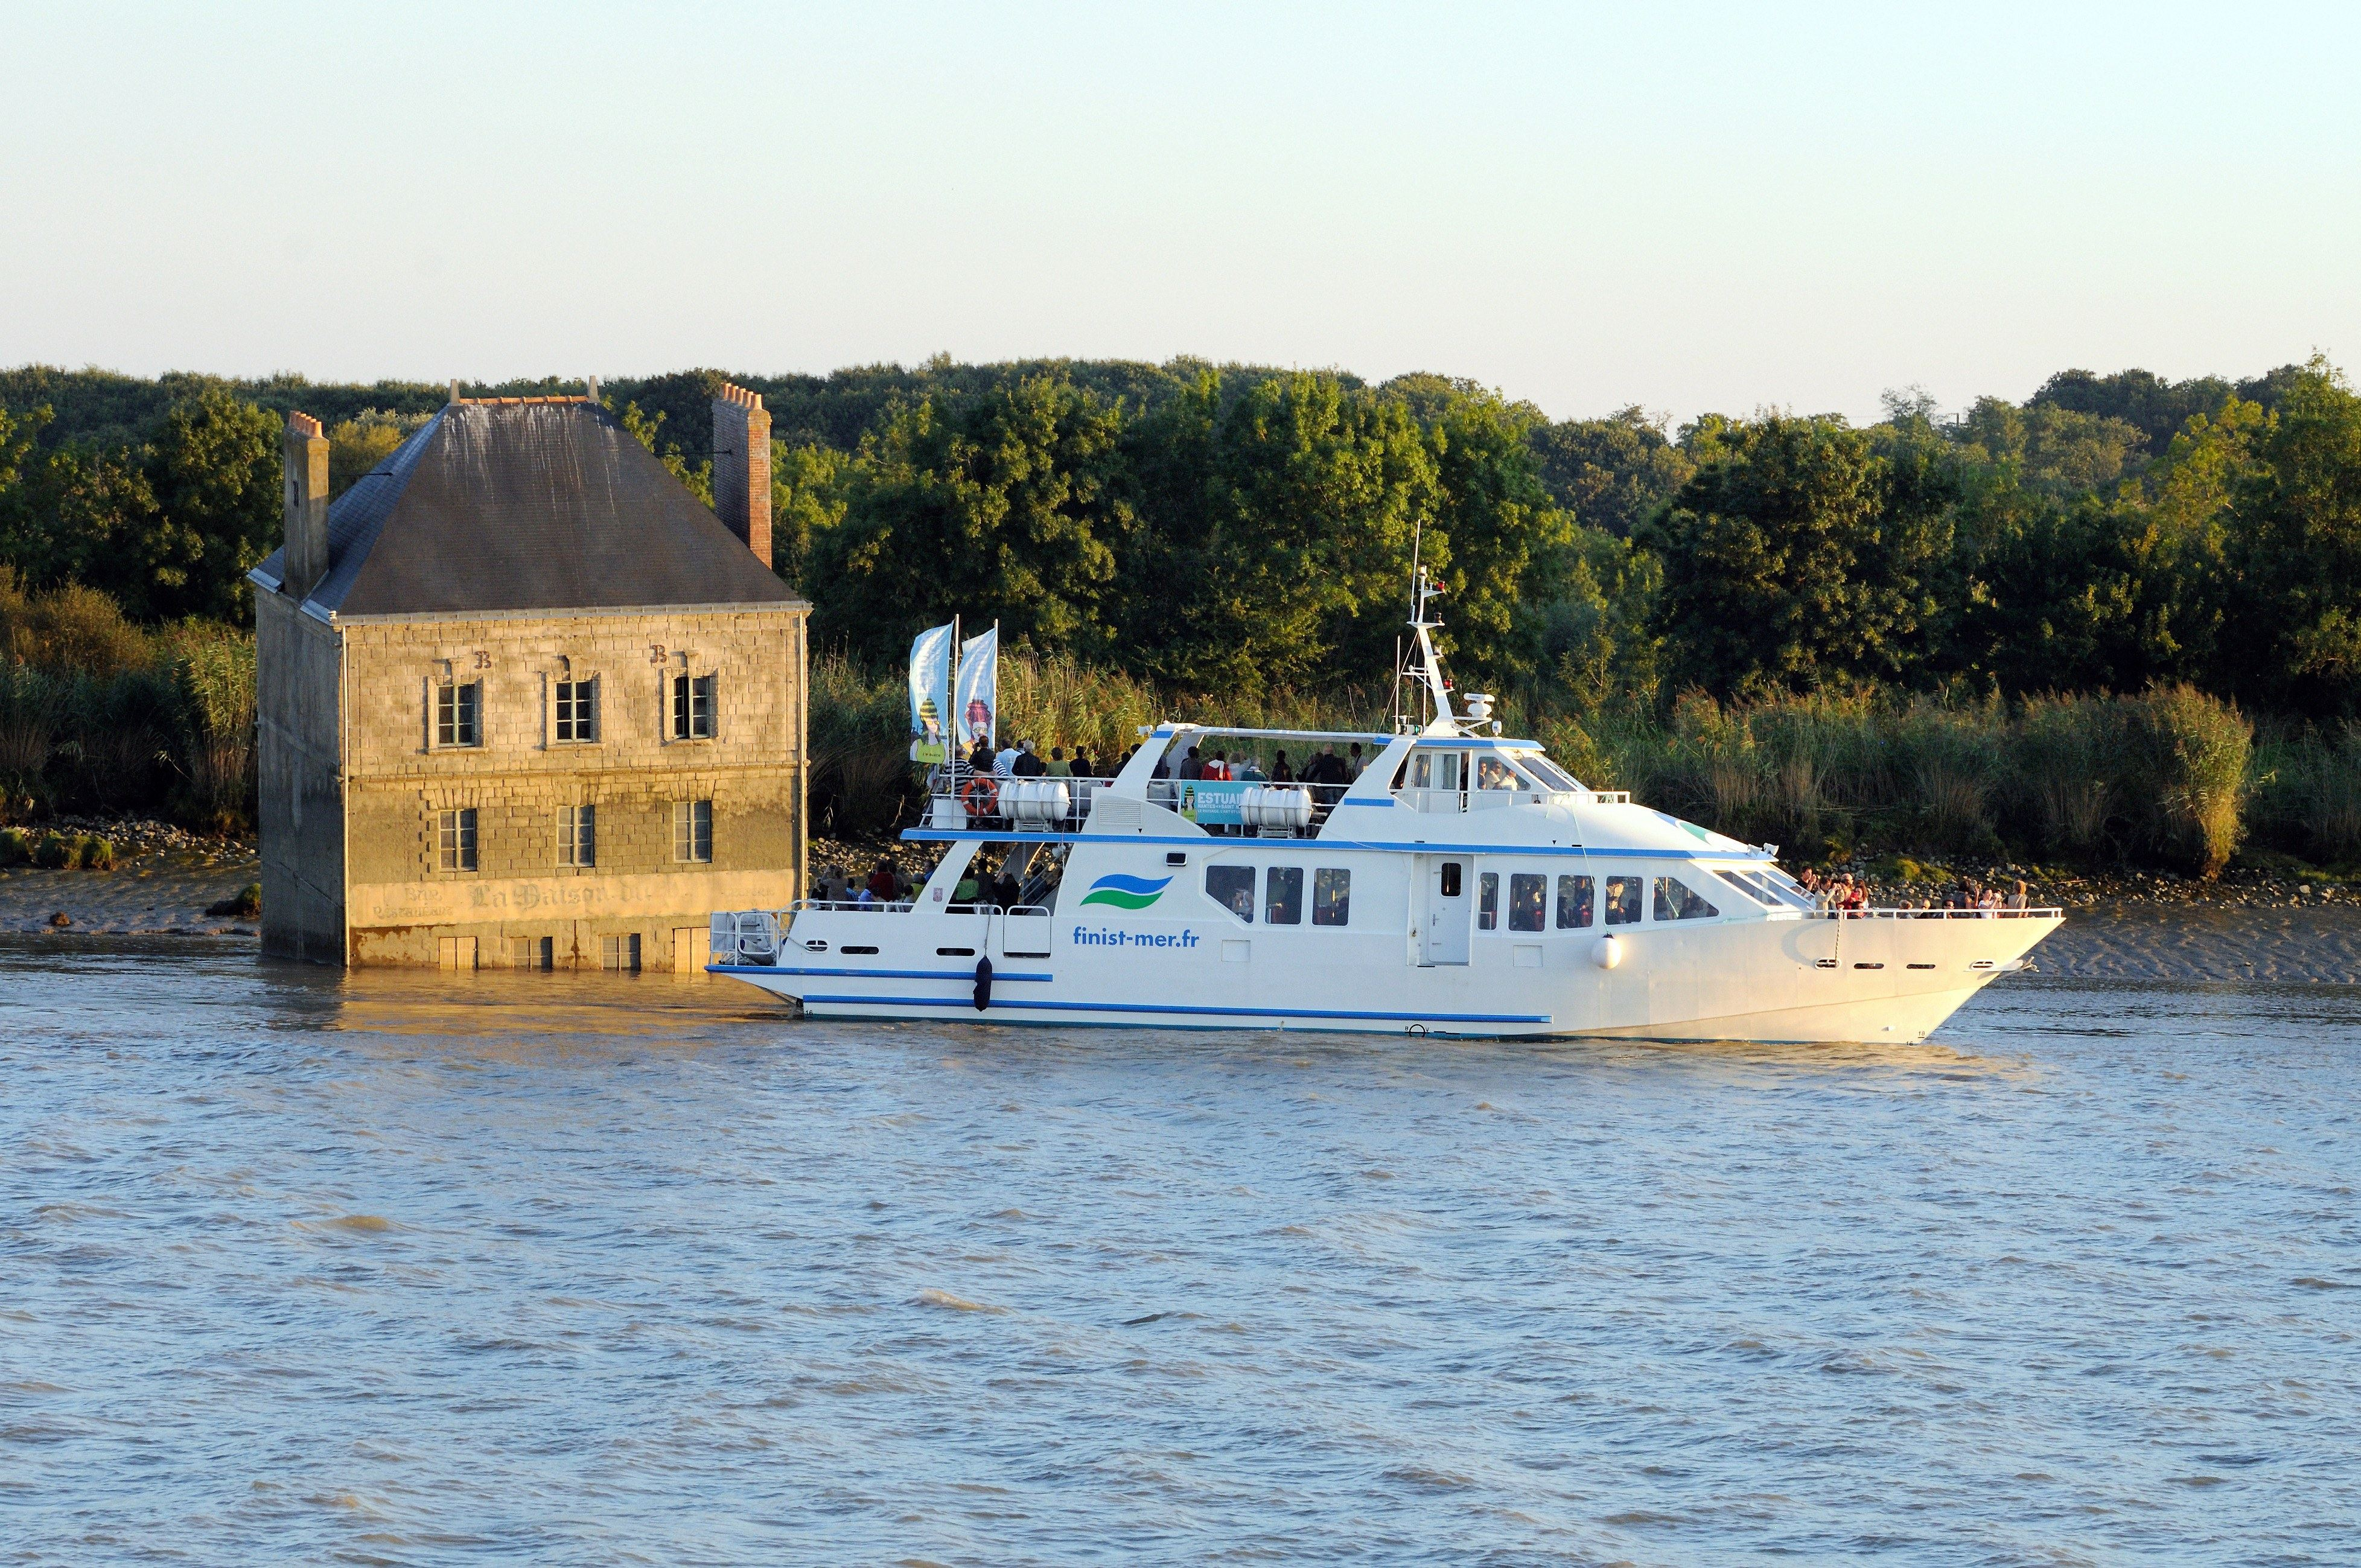 Estuary Cruise Nantes to Saint-Nazaire - one way cruise